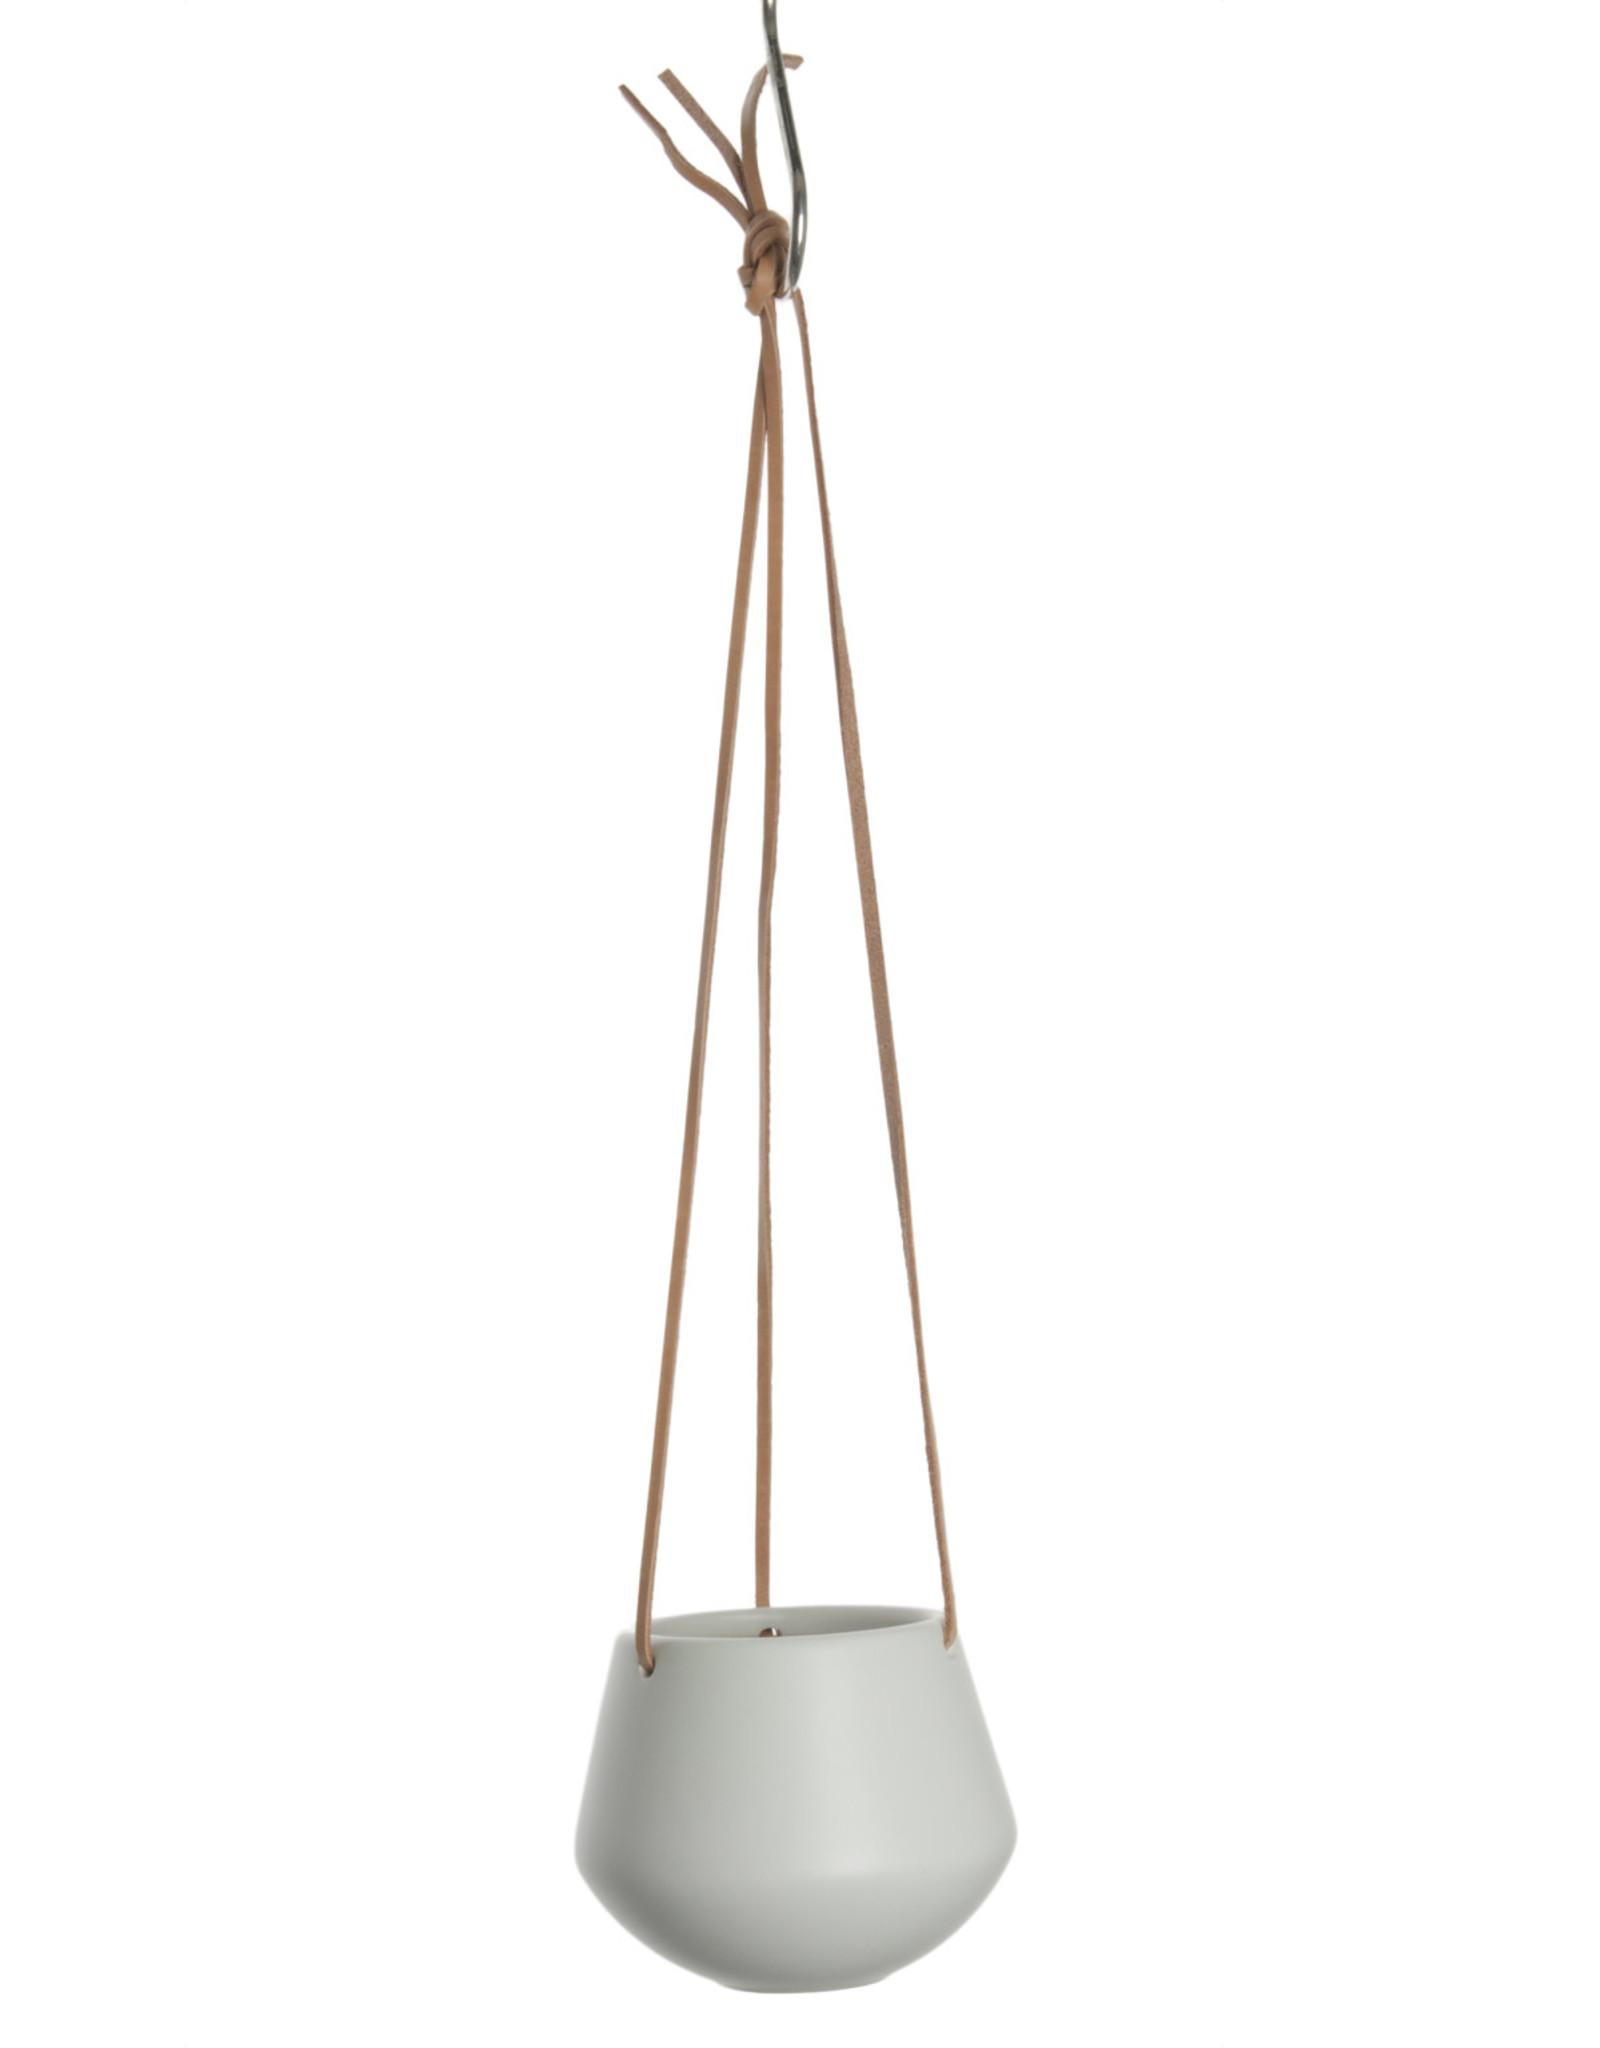 pt Skittle hangpot Ø9 cm, lengte 66 cm - Mat wit